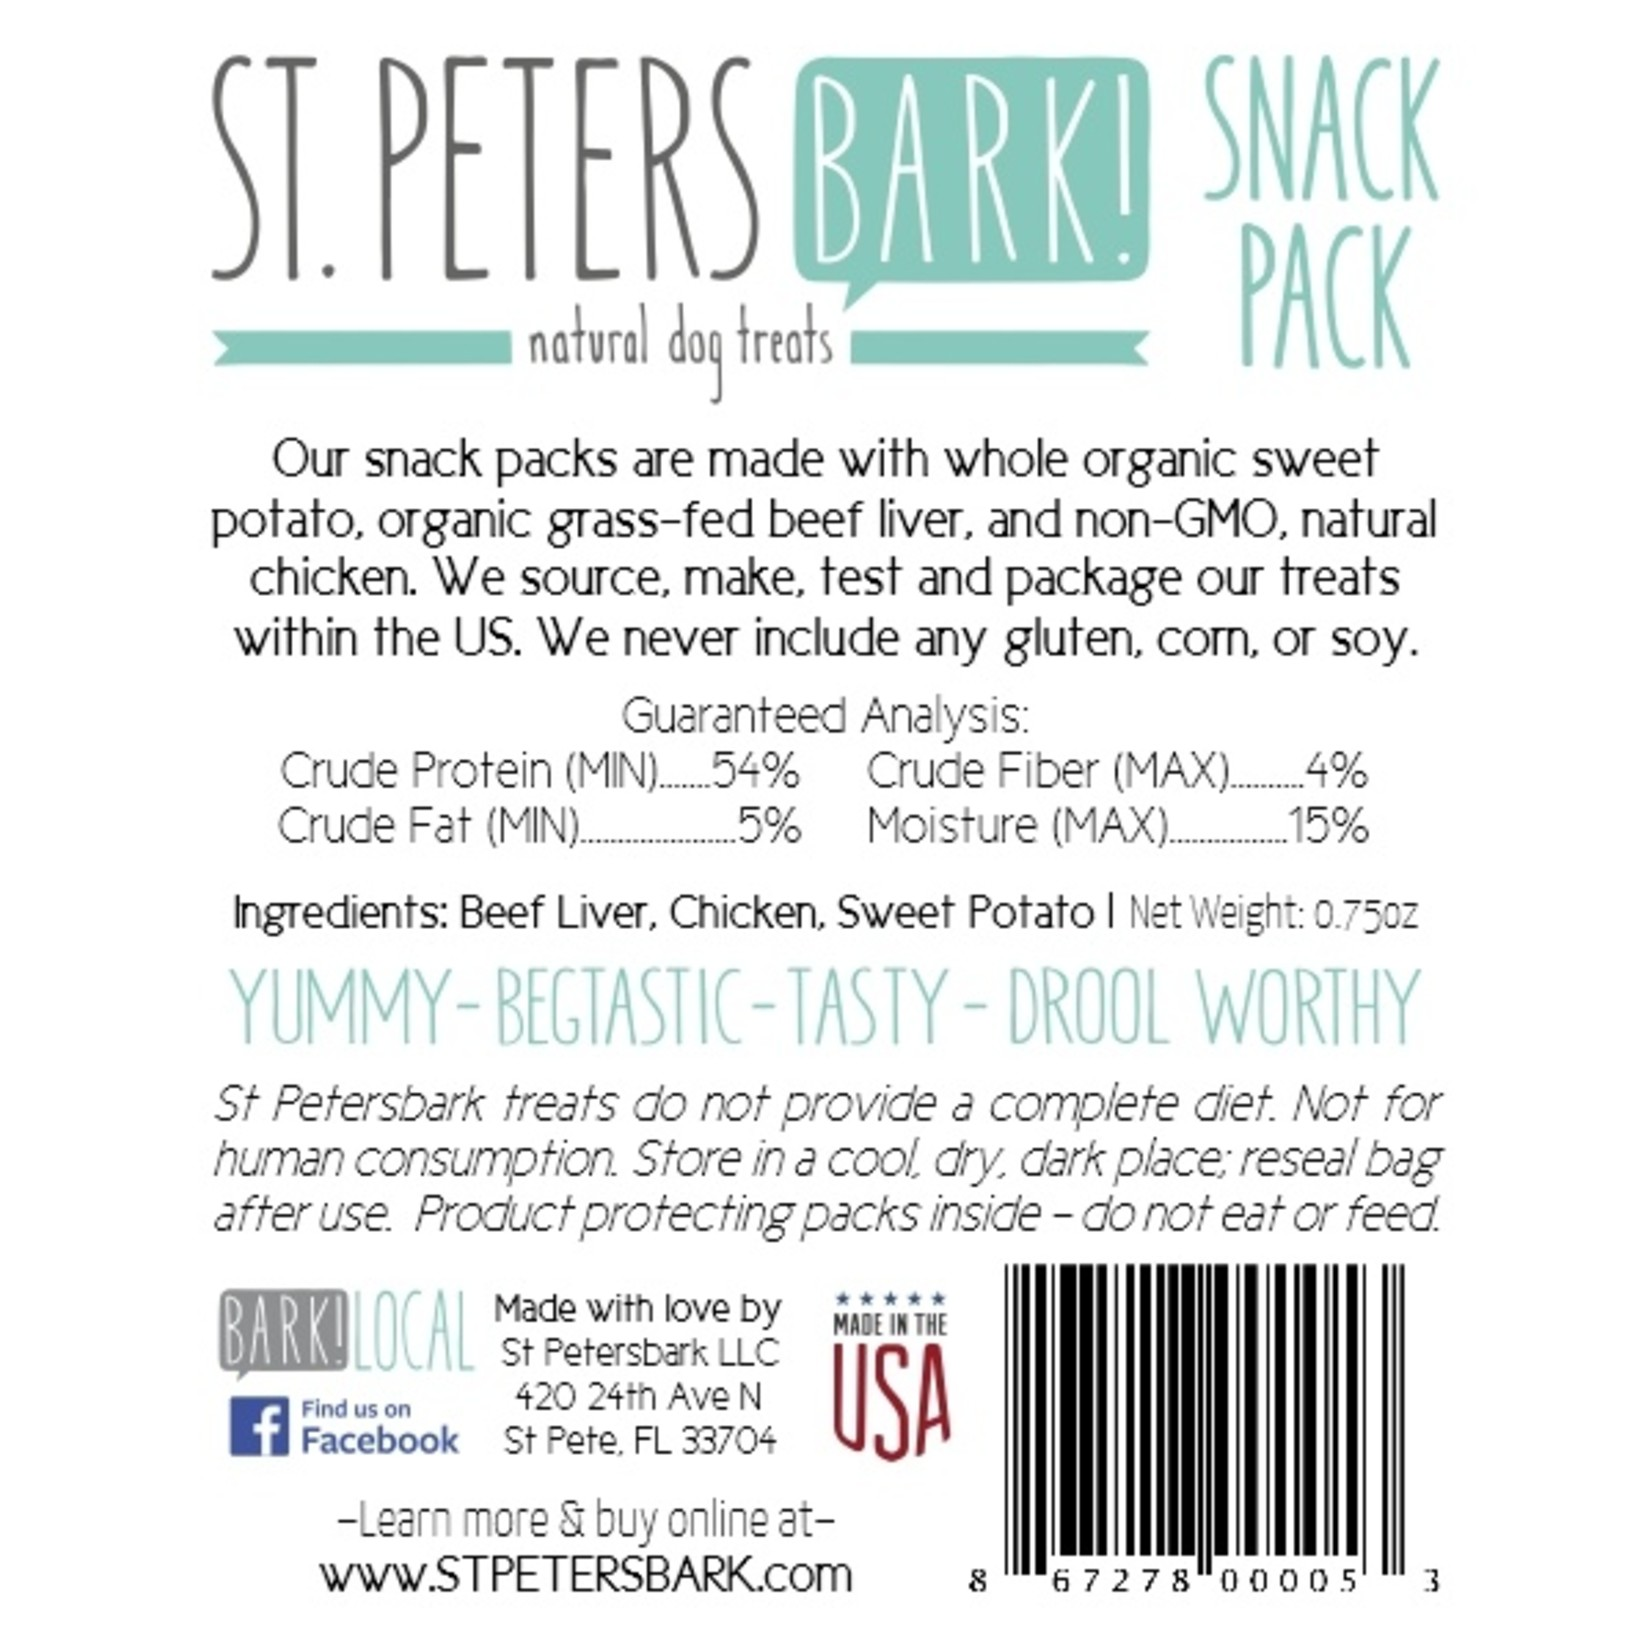 St PetersBARK! St. PetersBARK! Snack Pack Dog Treat 0.75oz